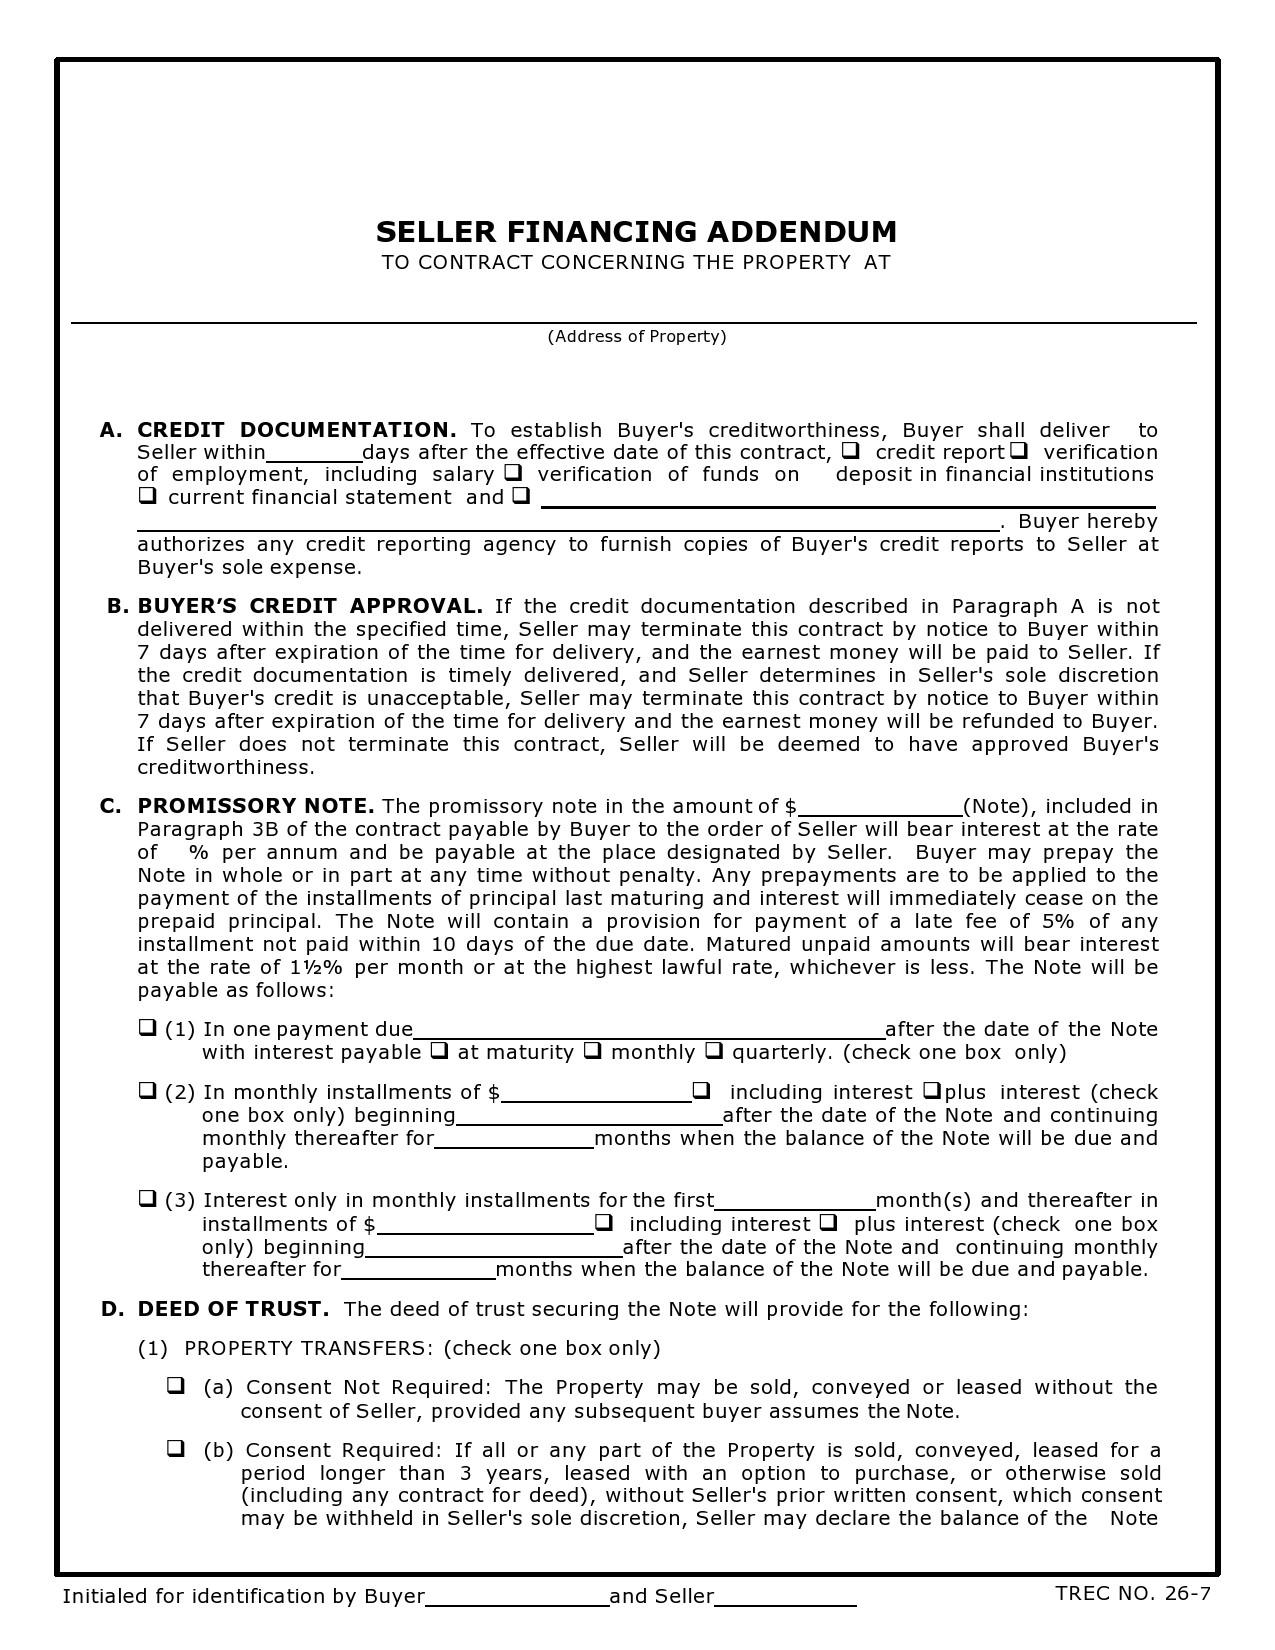 Free seller financing addendum 29